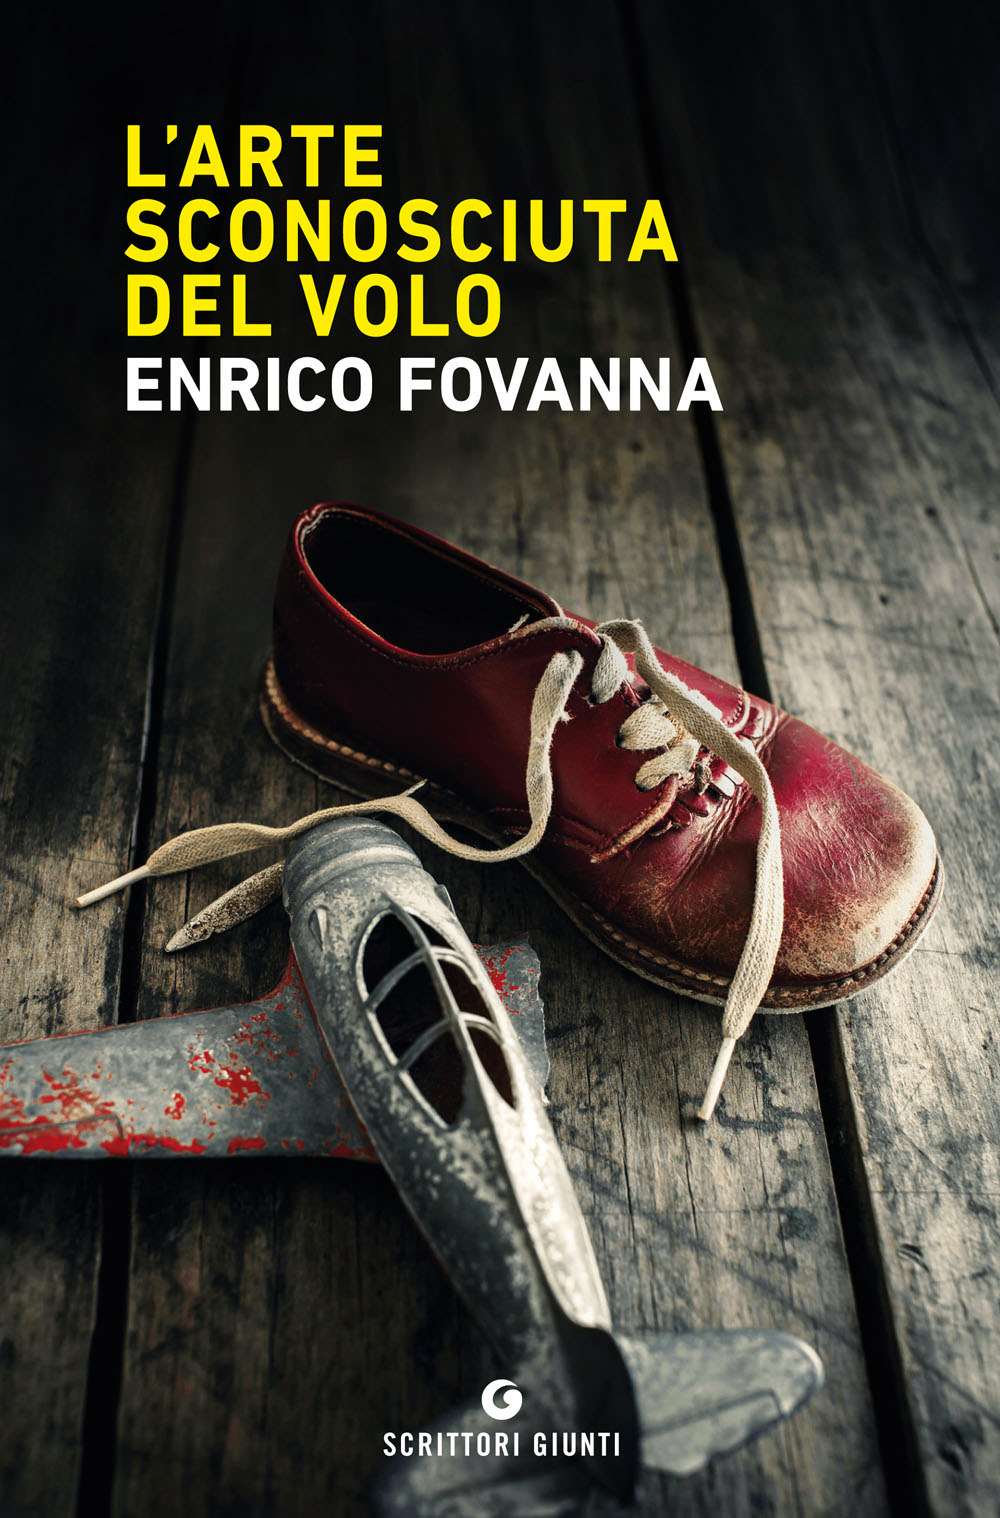 Enrico Fovanna